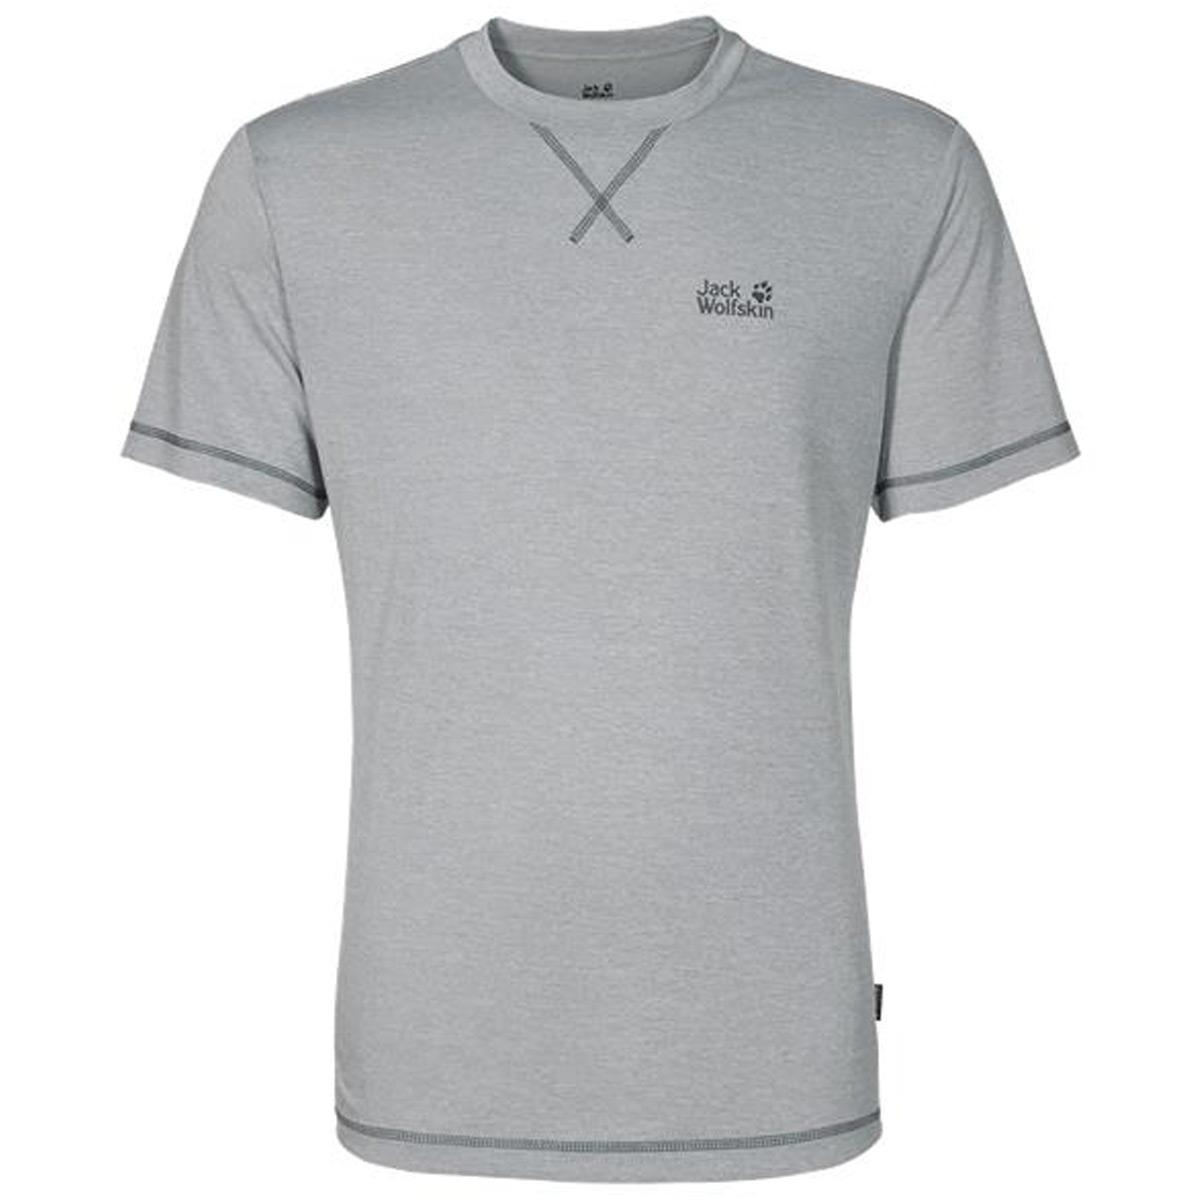 Jack-Wolfskin-Hombres-2019-Crosstrail-Transpirable-Ligero-Camiseta-31-APAGADO-PVP